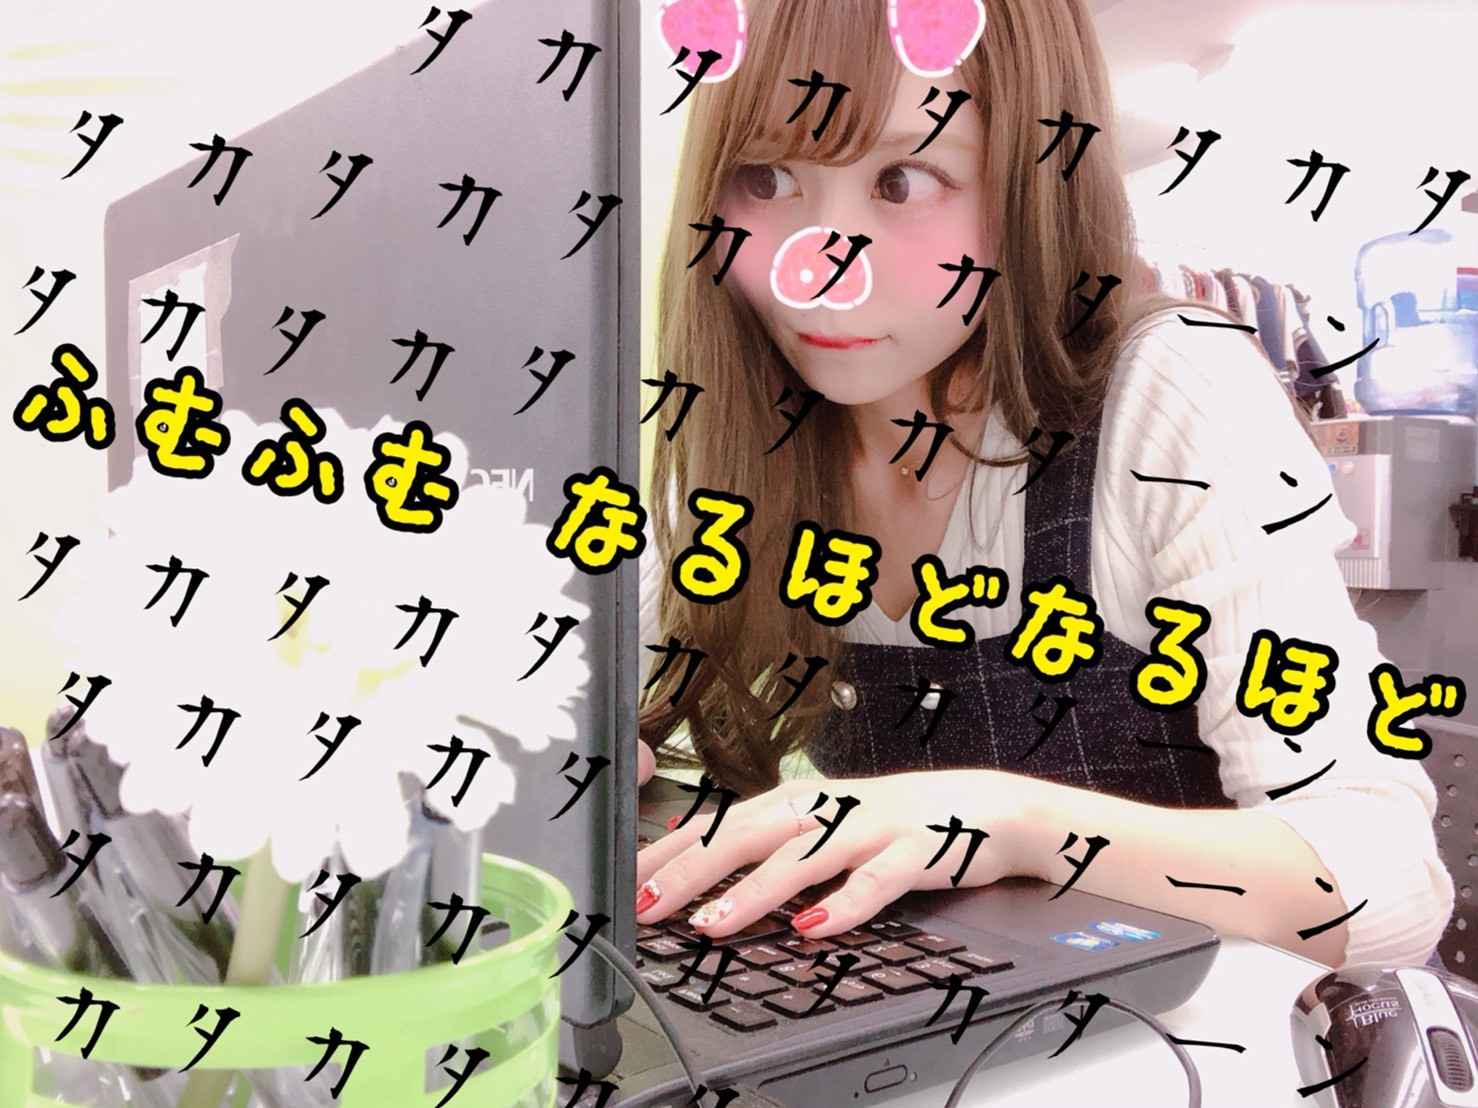 S__14966789.jpg